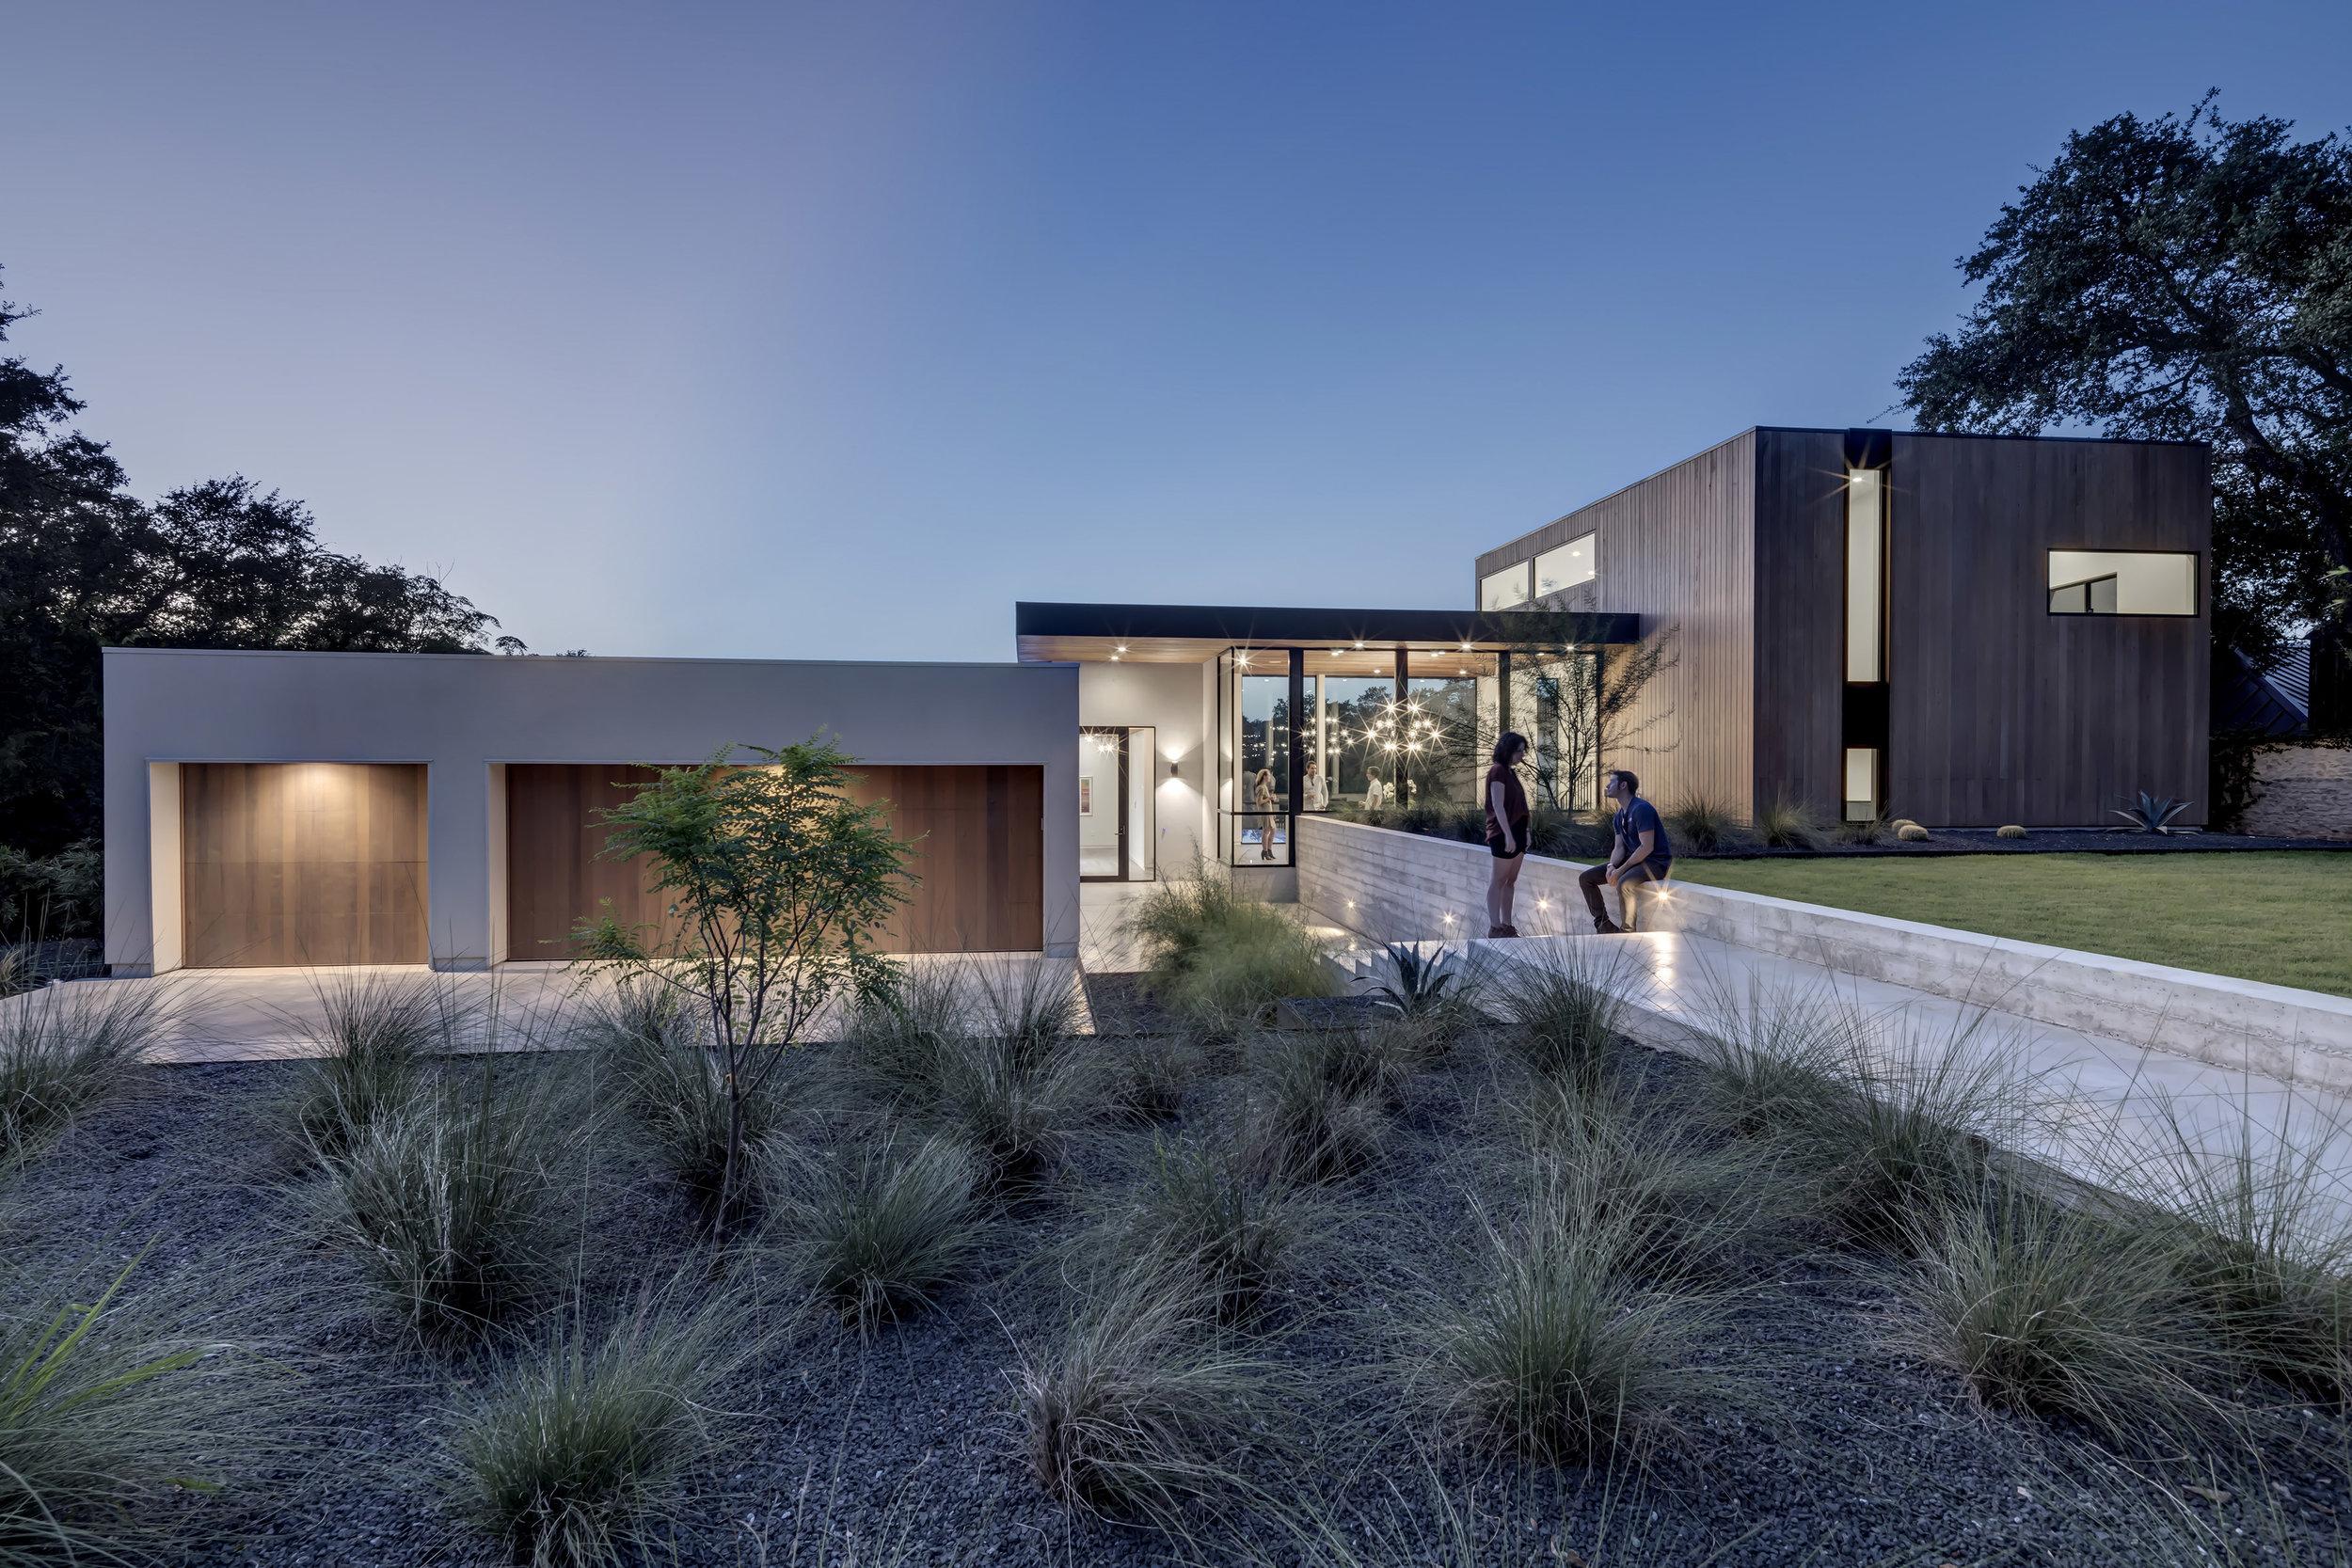 Matt Fajkus MF Architecture Bracketed Space House Photo 1 by Charles Davis Smith.jpg